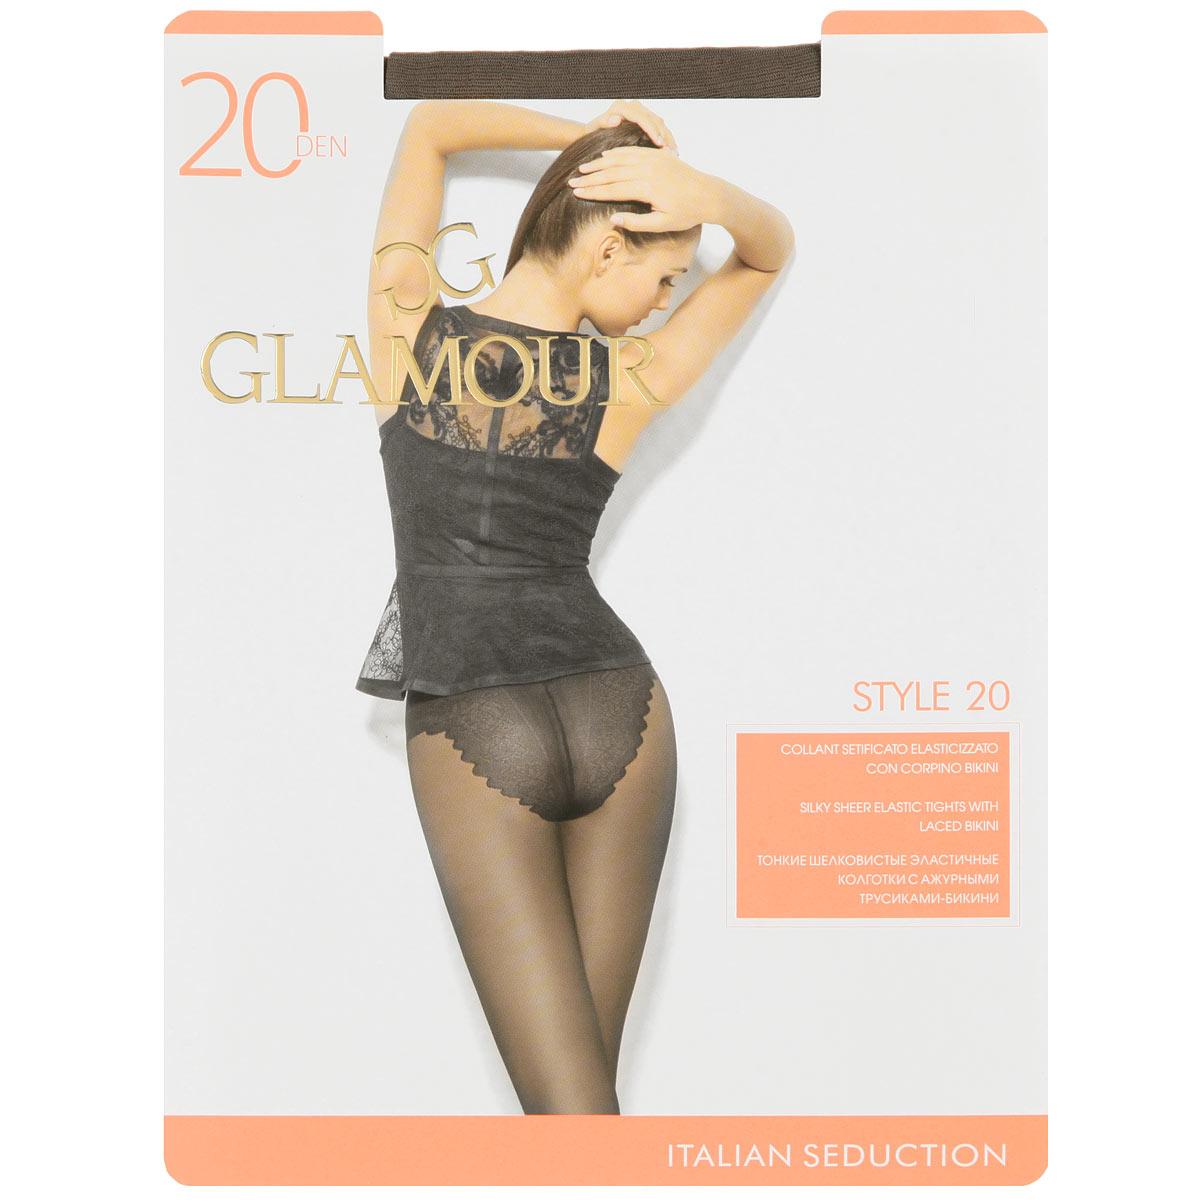 Колготки женские Glamour Style 20, цвет: Daino (загар). Размер 5 (XL) колготки женские glamour style 20 цвет daino загар размер 5 xl